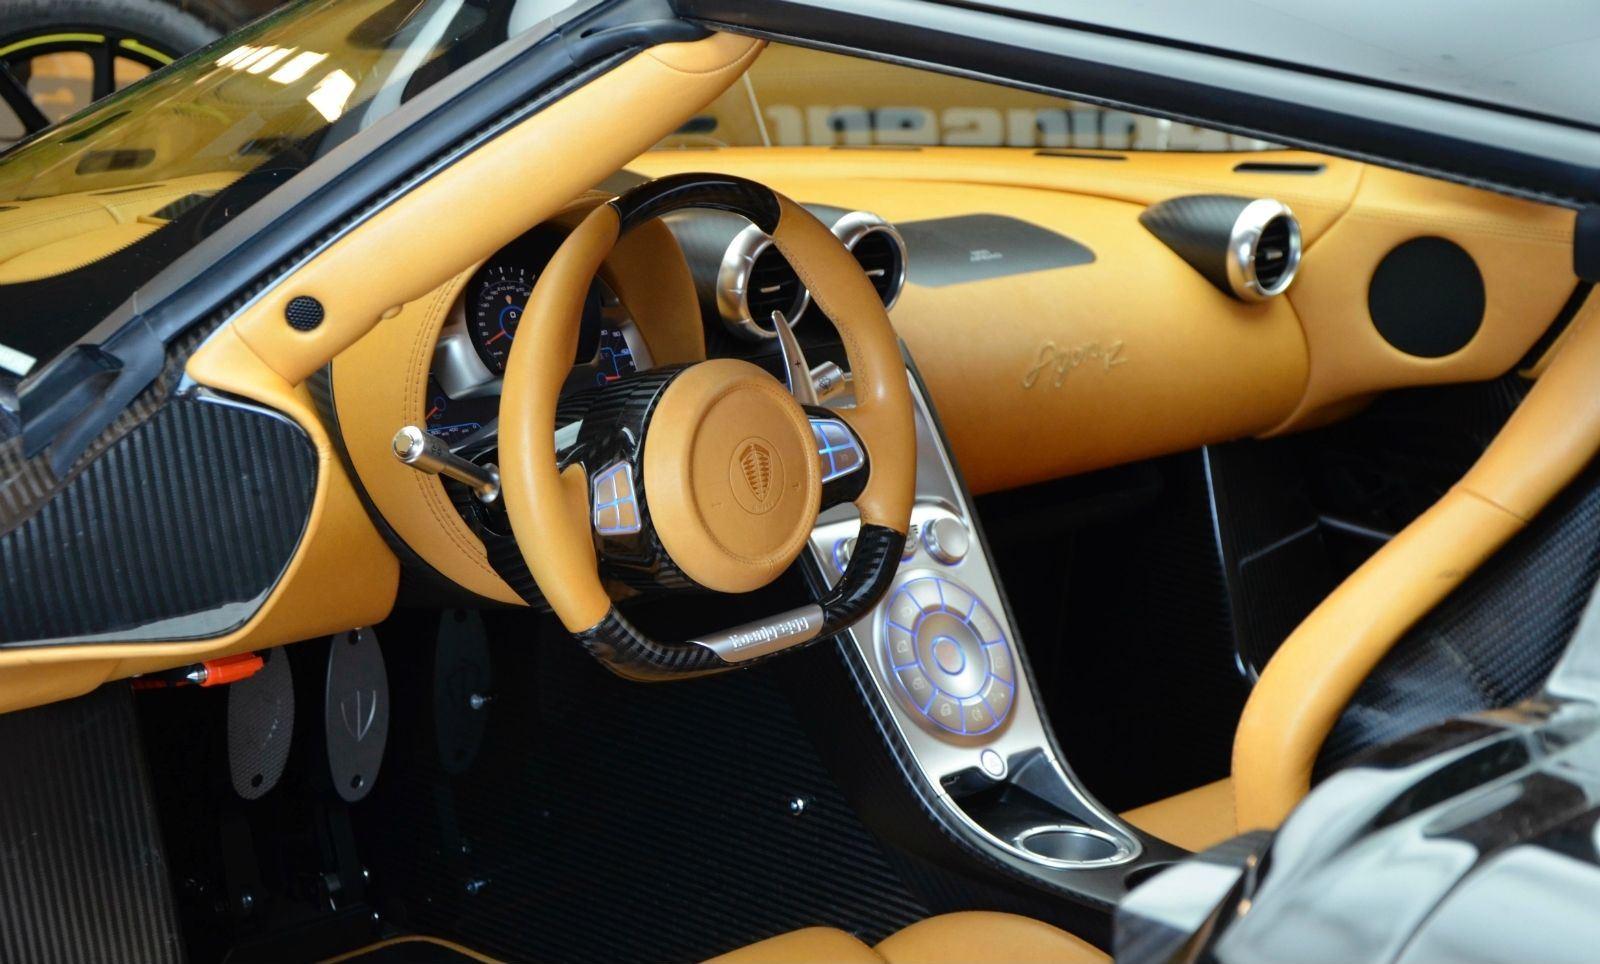 Koenigsegg koenigsegg agera r interior : Koenigsegg-Agera-R-for-sale-3.jpg